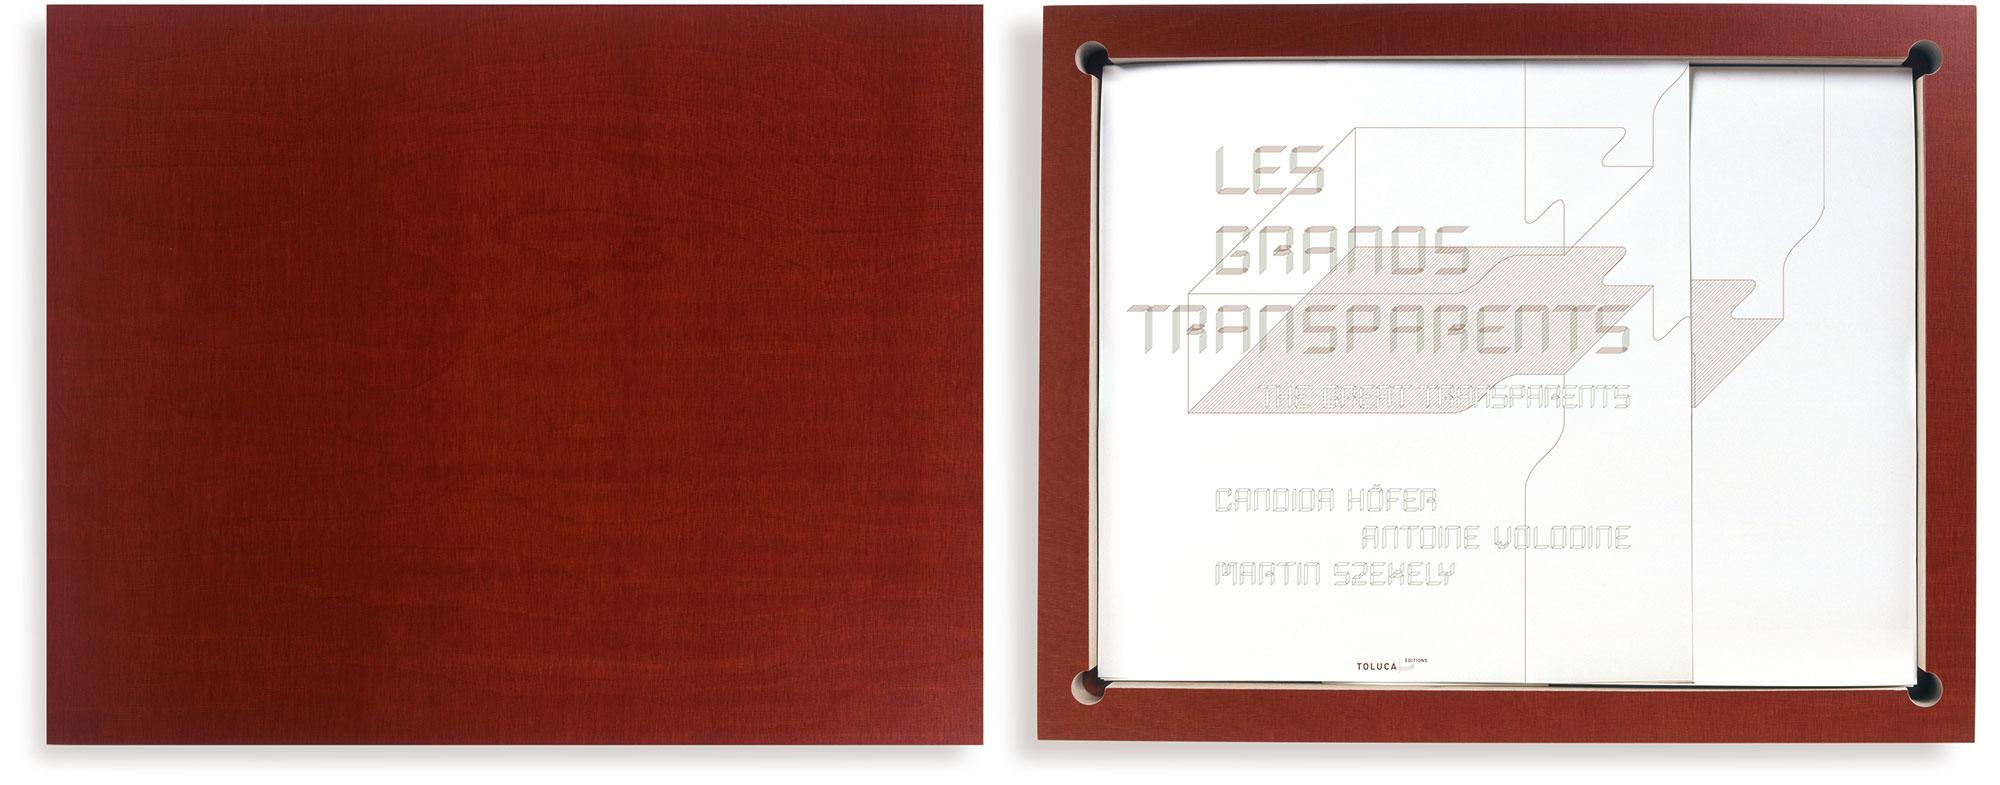 Candida Höfer (photos), Antoine Volodine (text), Martin Szekely (case), Les Grands Transparents, 2006 (51,2 x 40,3 x 3,5 cm)